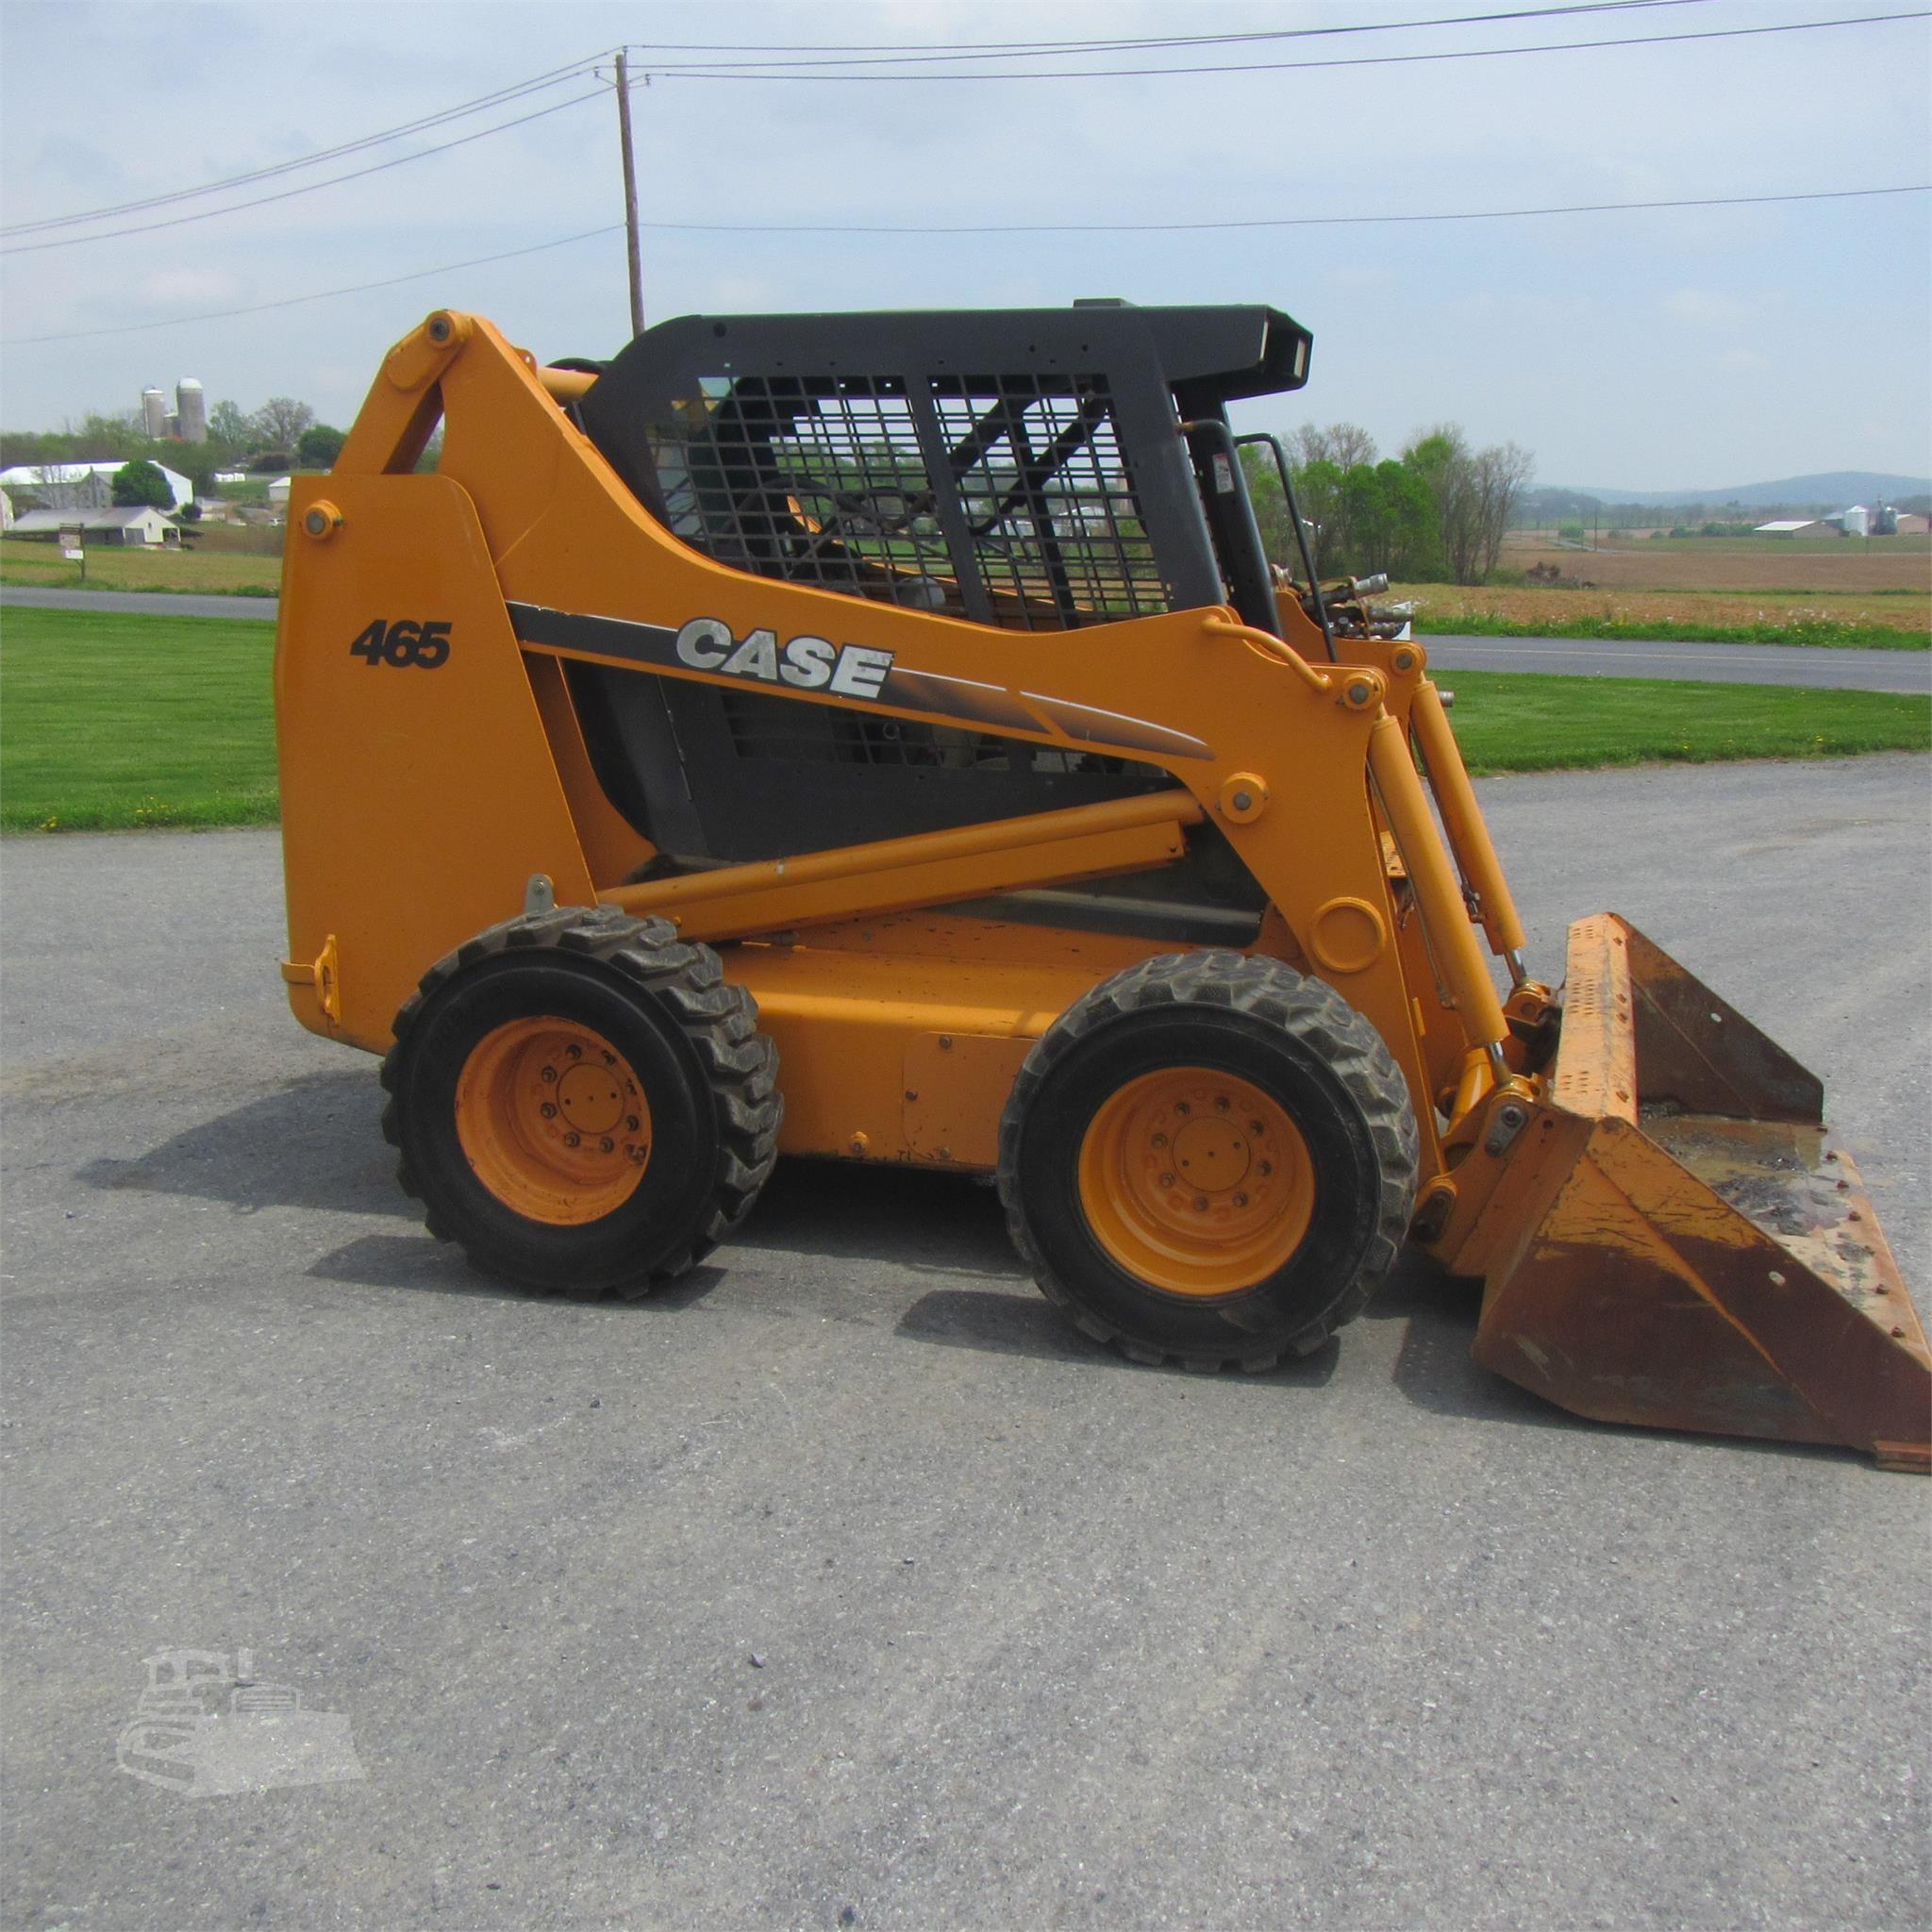 2005 CASE 465 Sale In Pennsylvania #995812